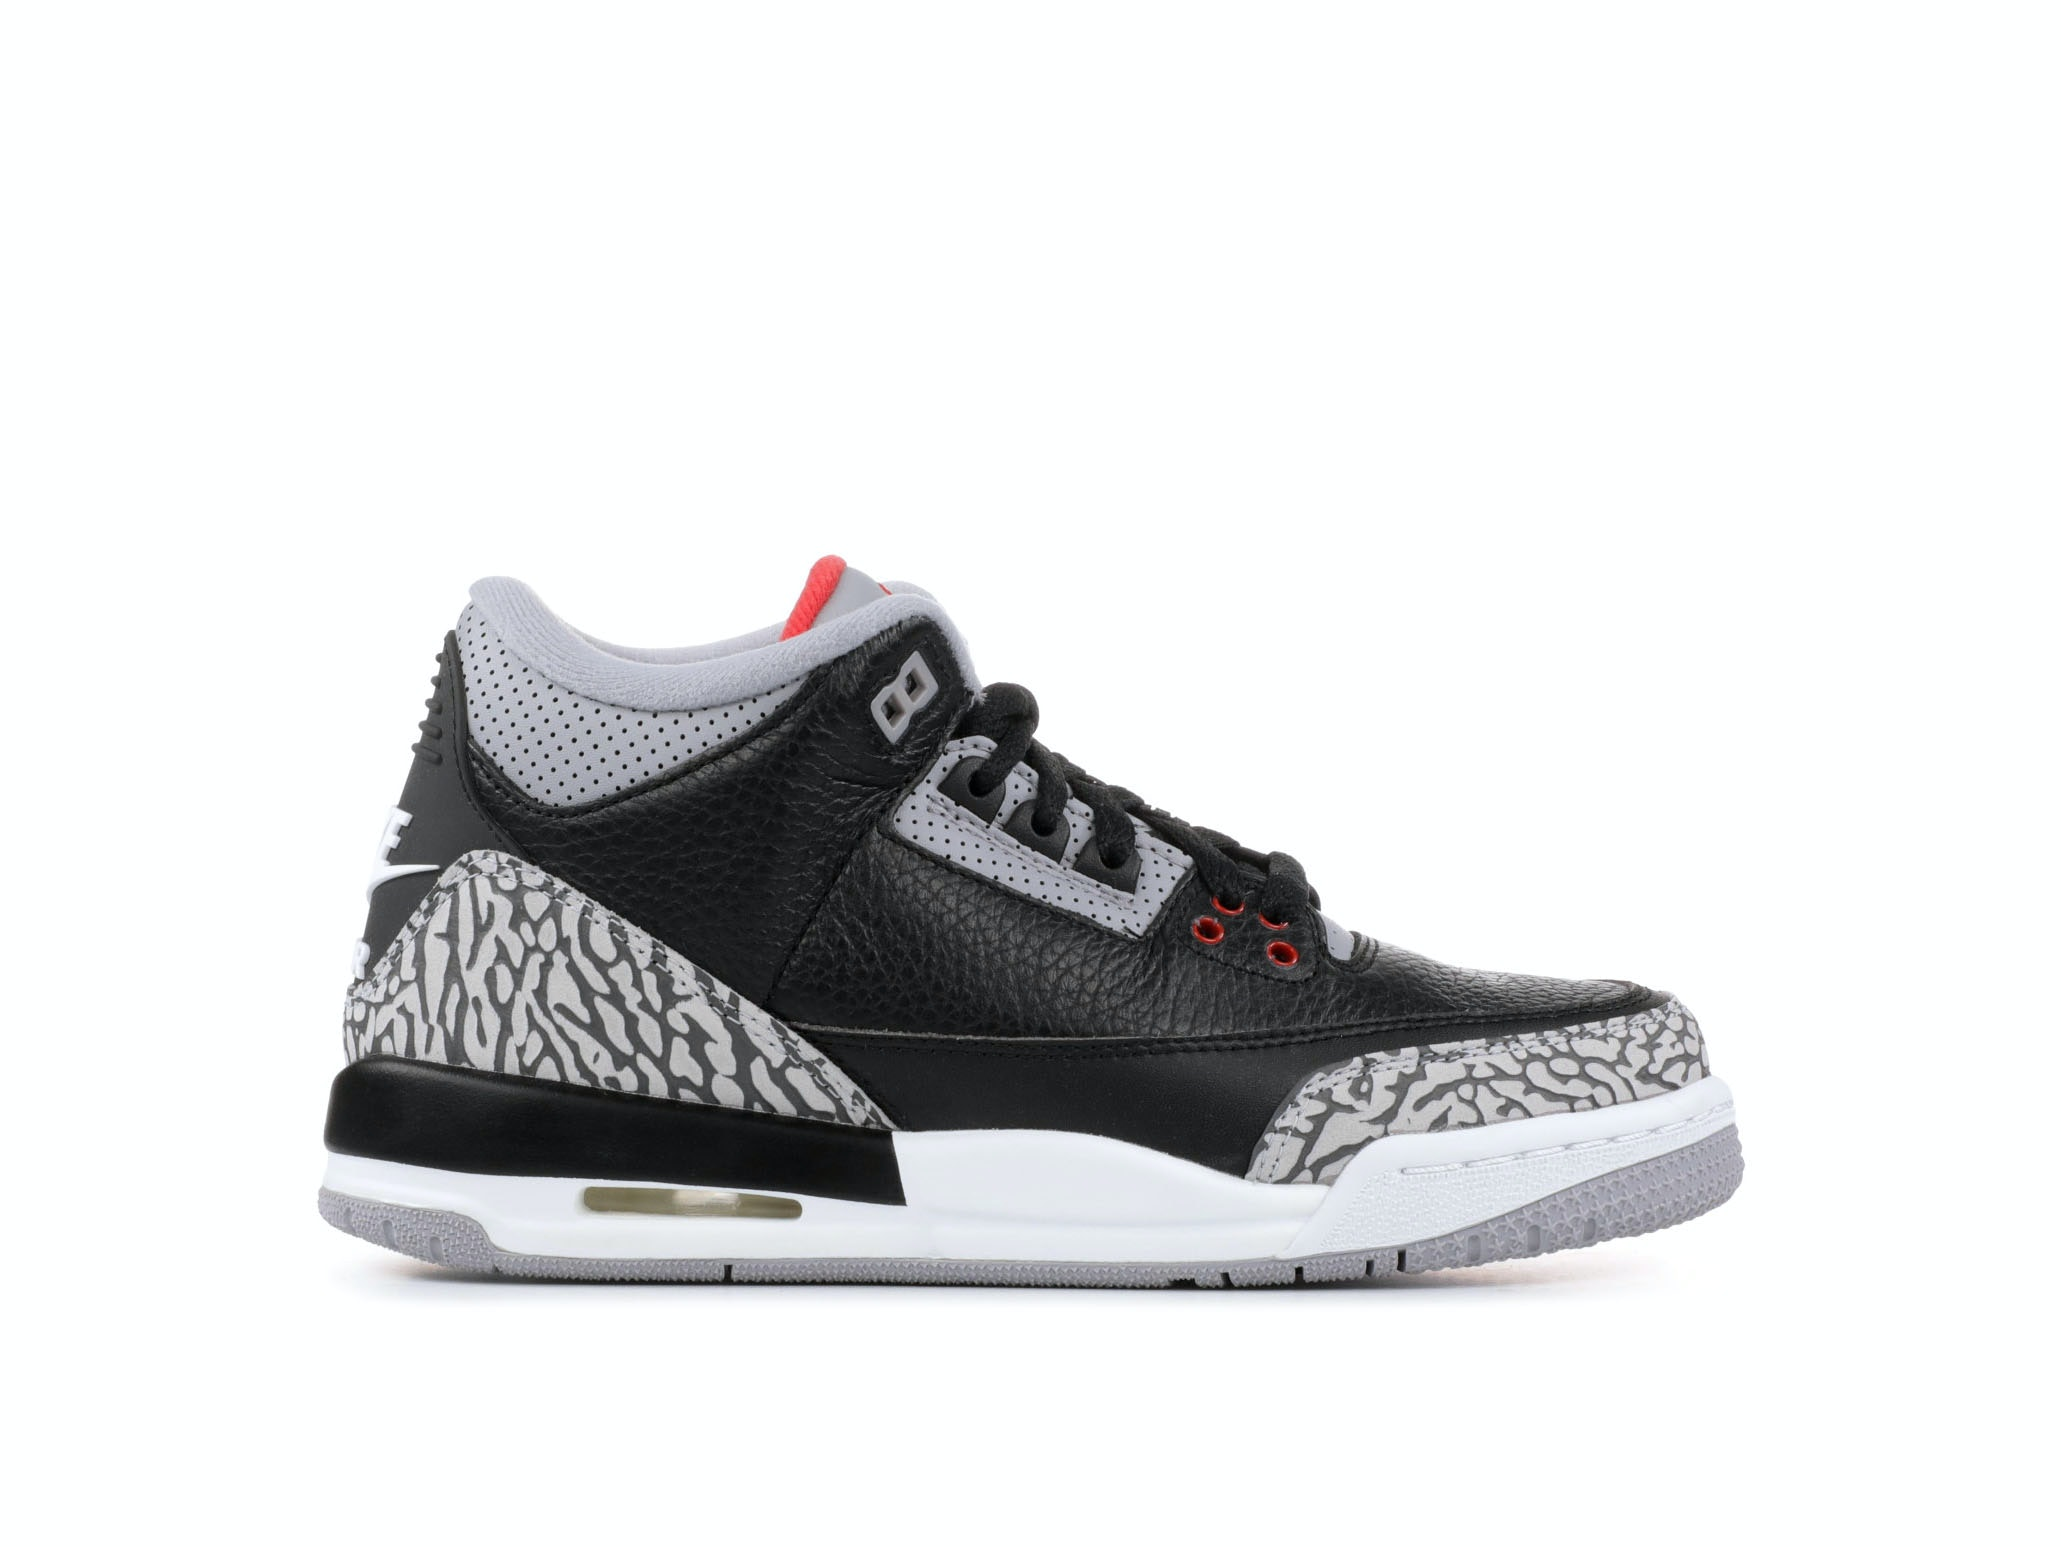 9bddea0b254dcf Shop Air Jordan 3 Retro OG BG 2018 Black Cement Online